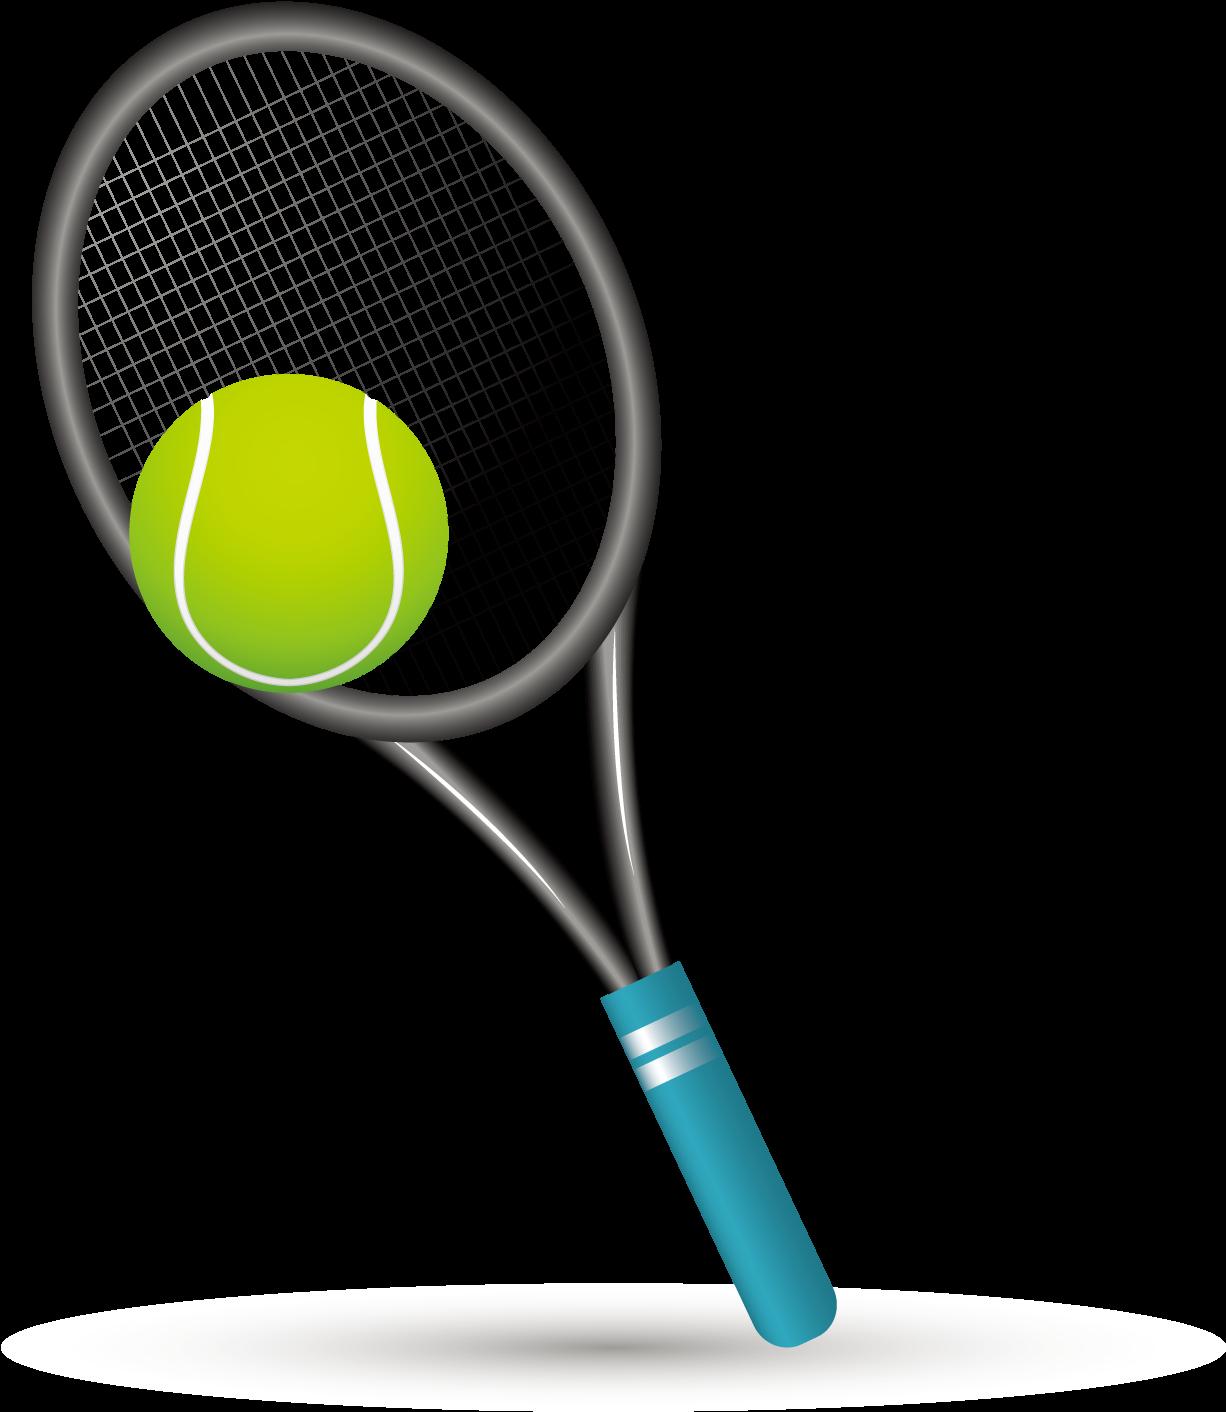 HD Strings Tennis Racket Rakieta Tenisowa.